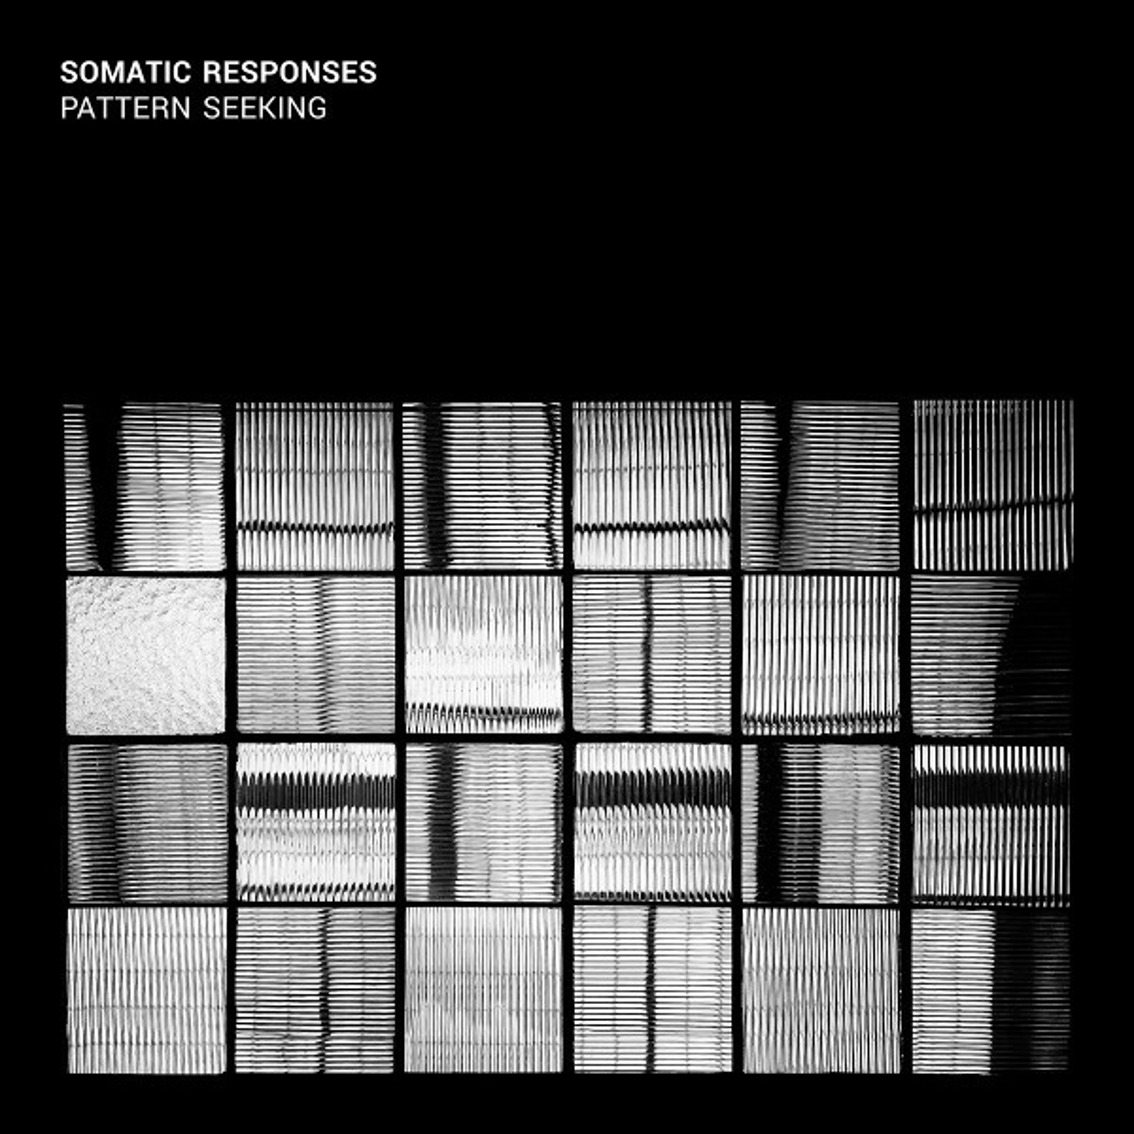 Somatic Responses choose for 'Pattern Seeking'